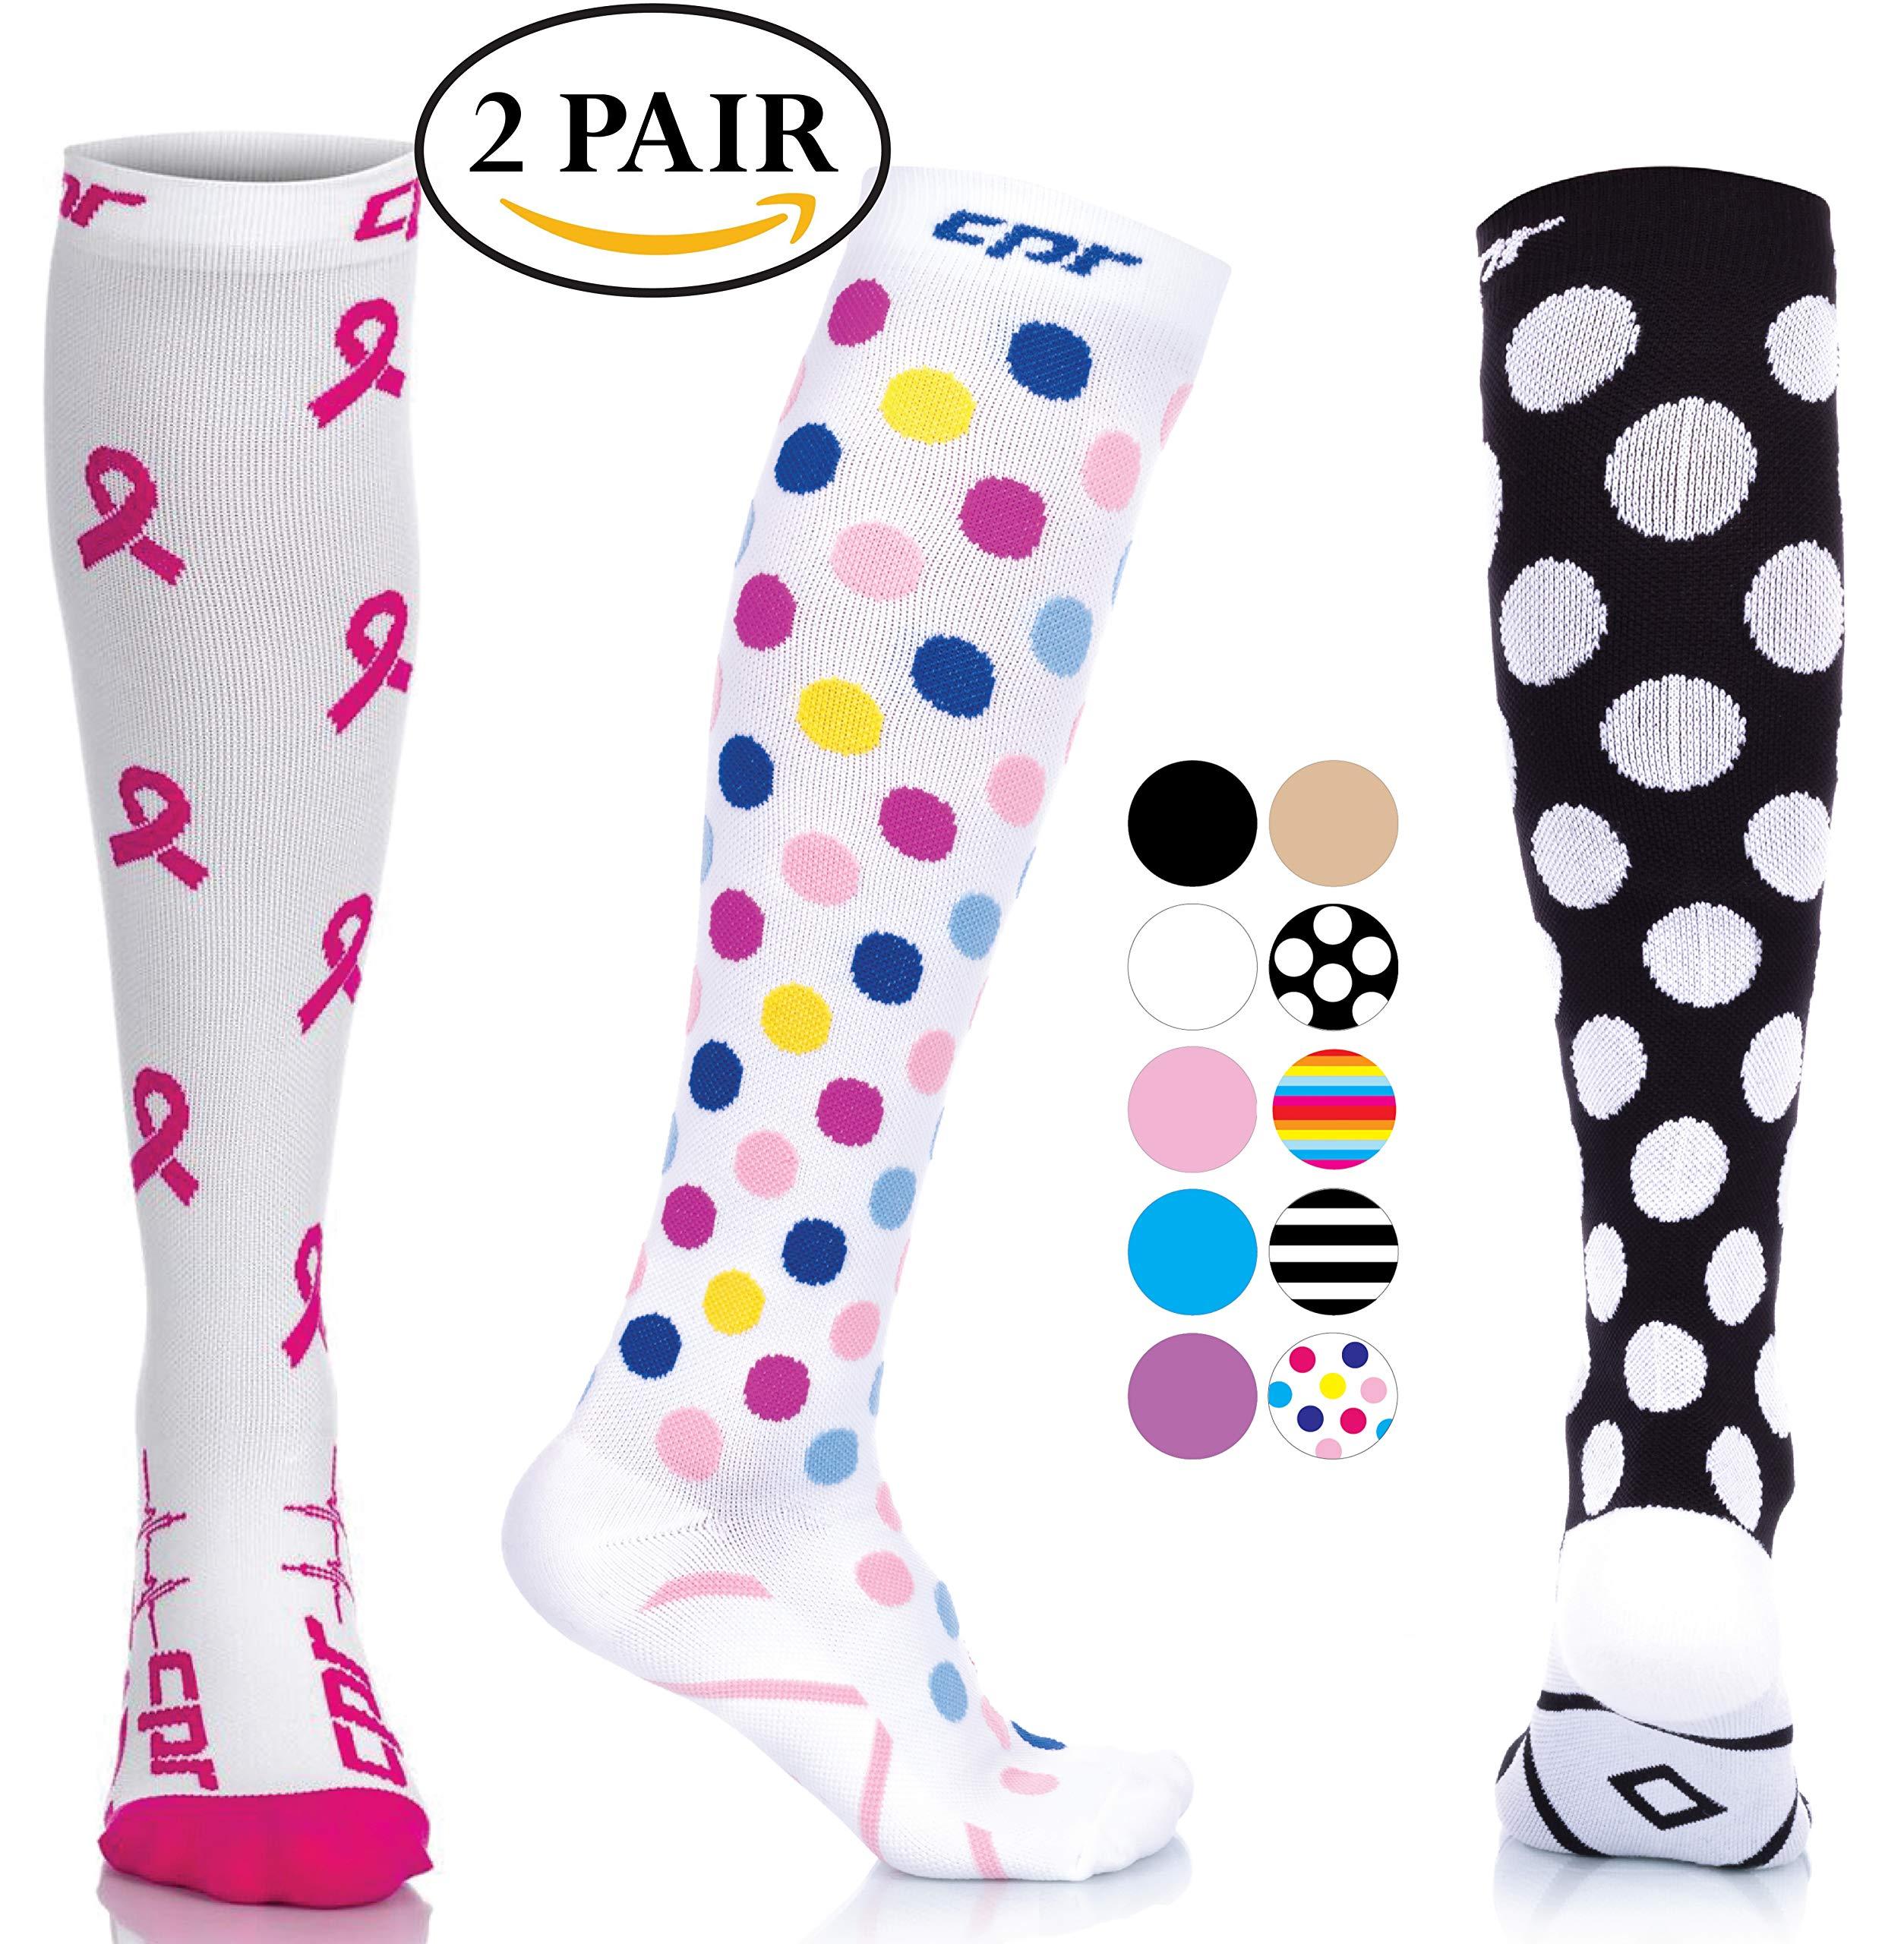 CPR Compression Socks for Women Men Nurses Compression Stockings for Woman Graduated Compression Sock 20 30 mmHg Knee High Nursing Travel Comfortable